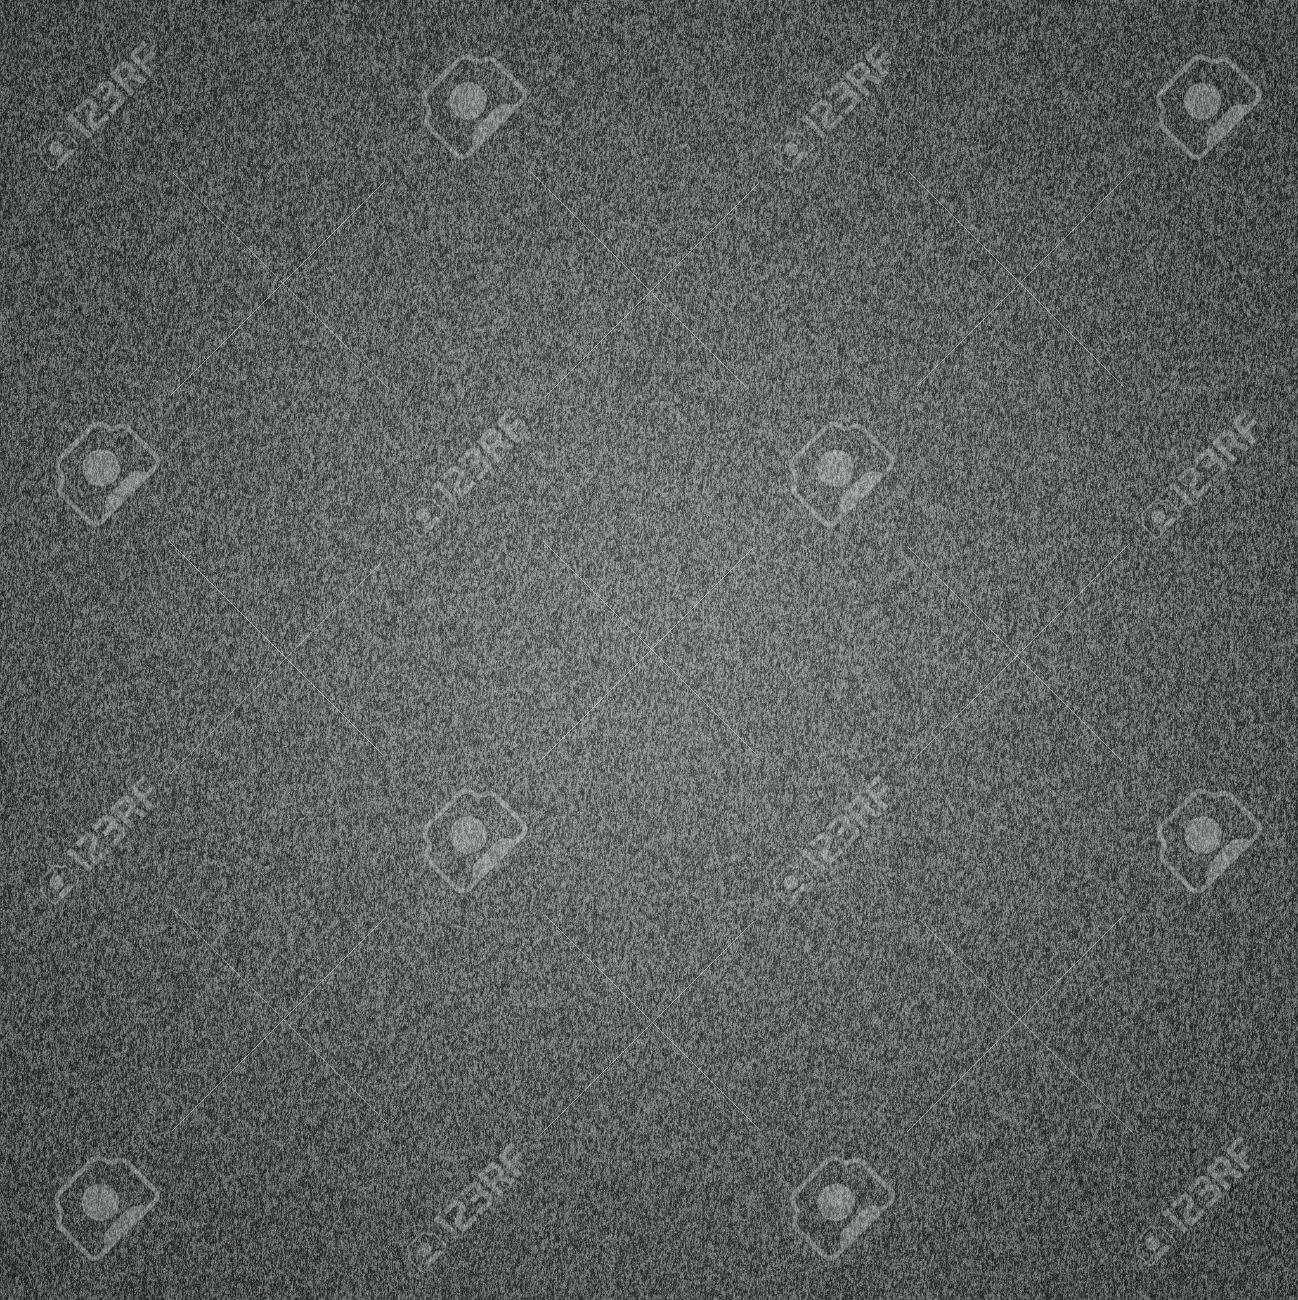 Carpet texture background Stock Photo - 21993120